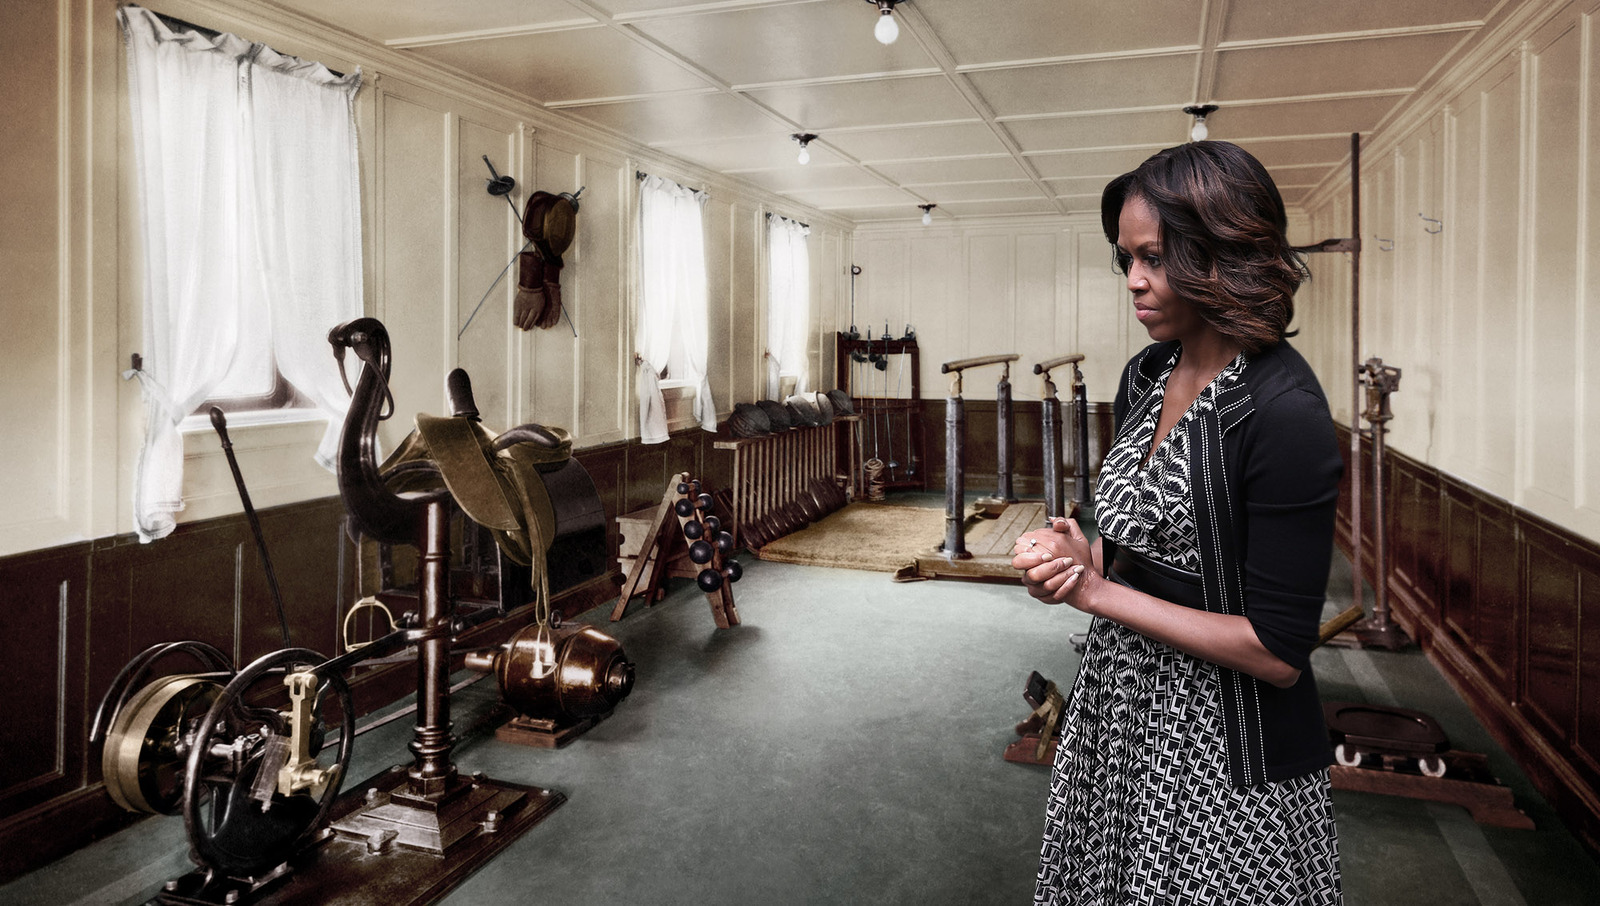 Michelle Obama Renovates Van Buren Workout Room